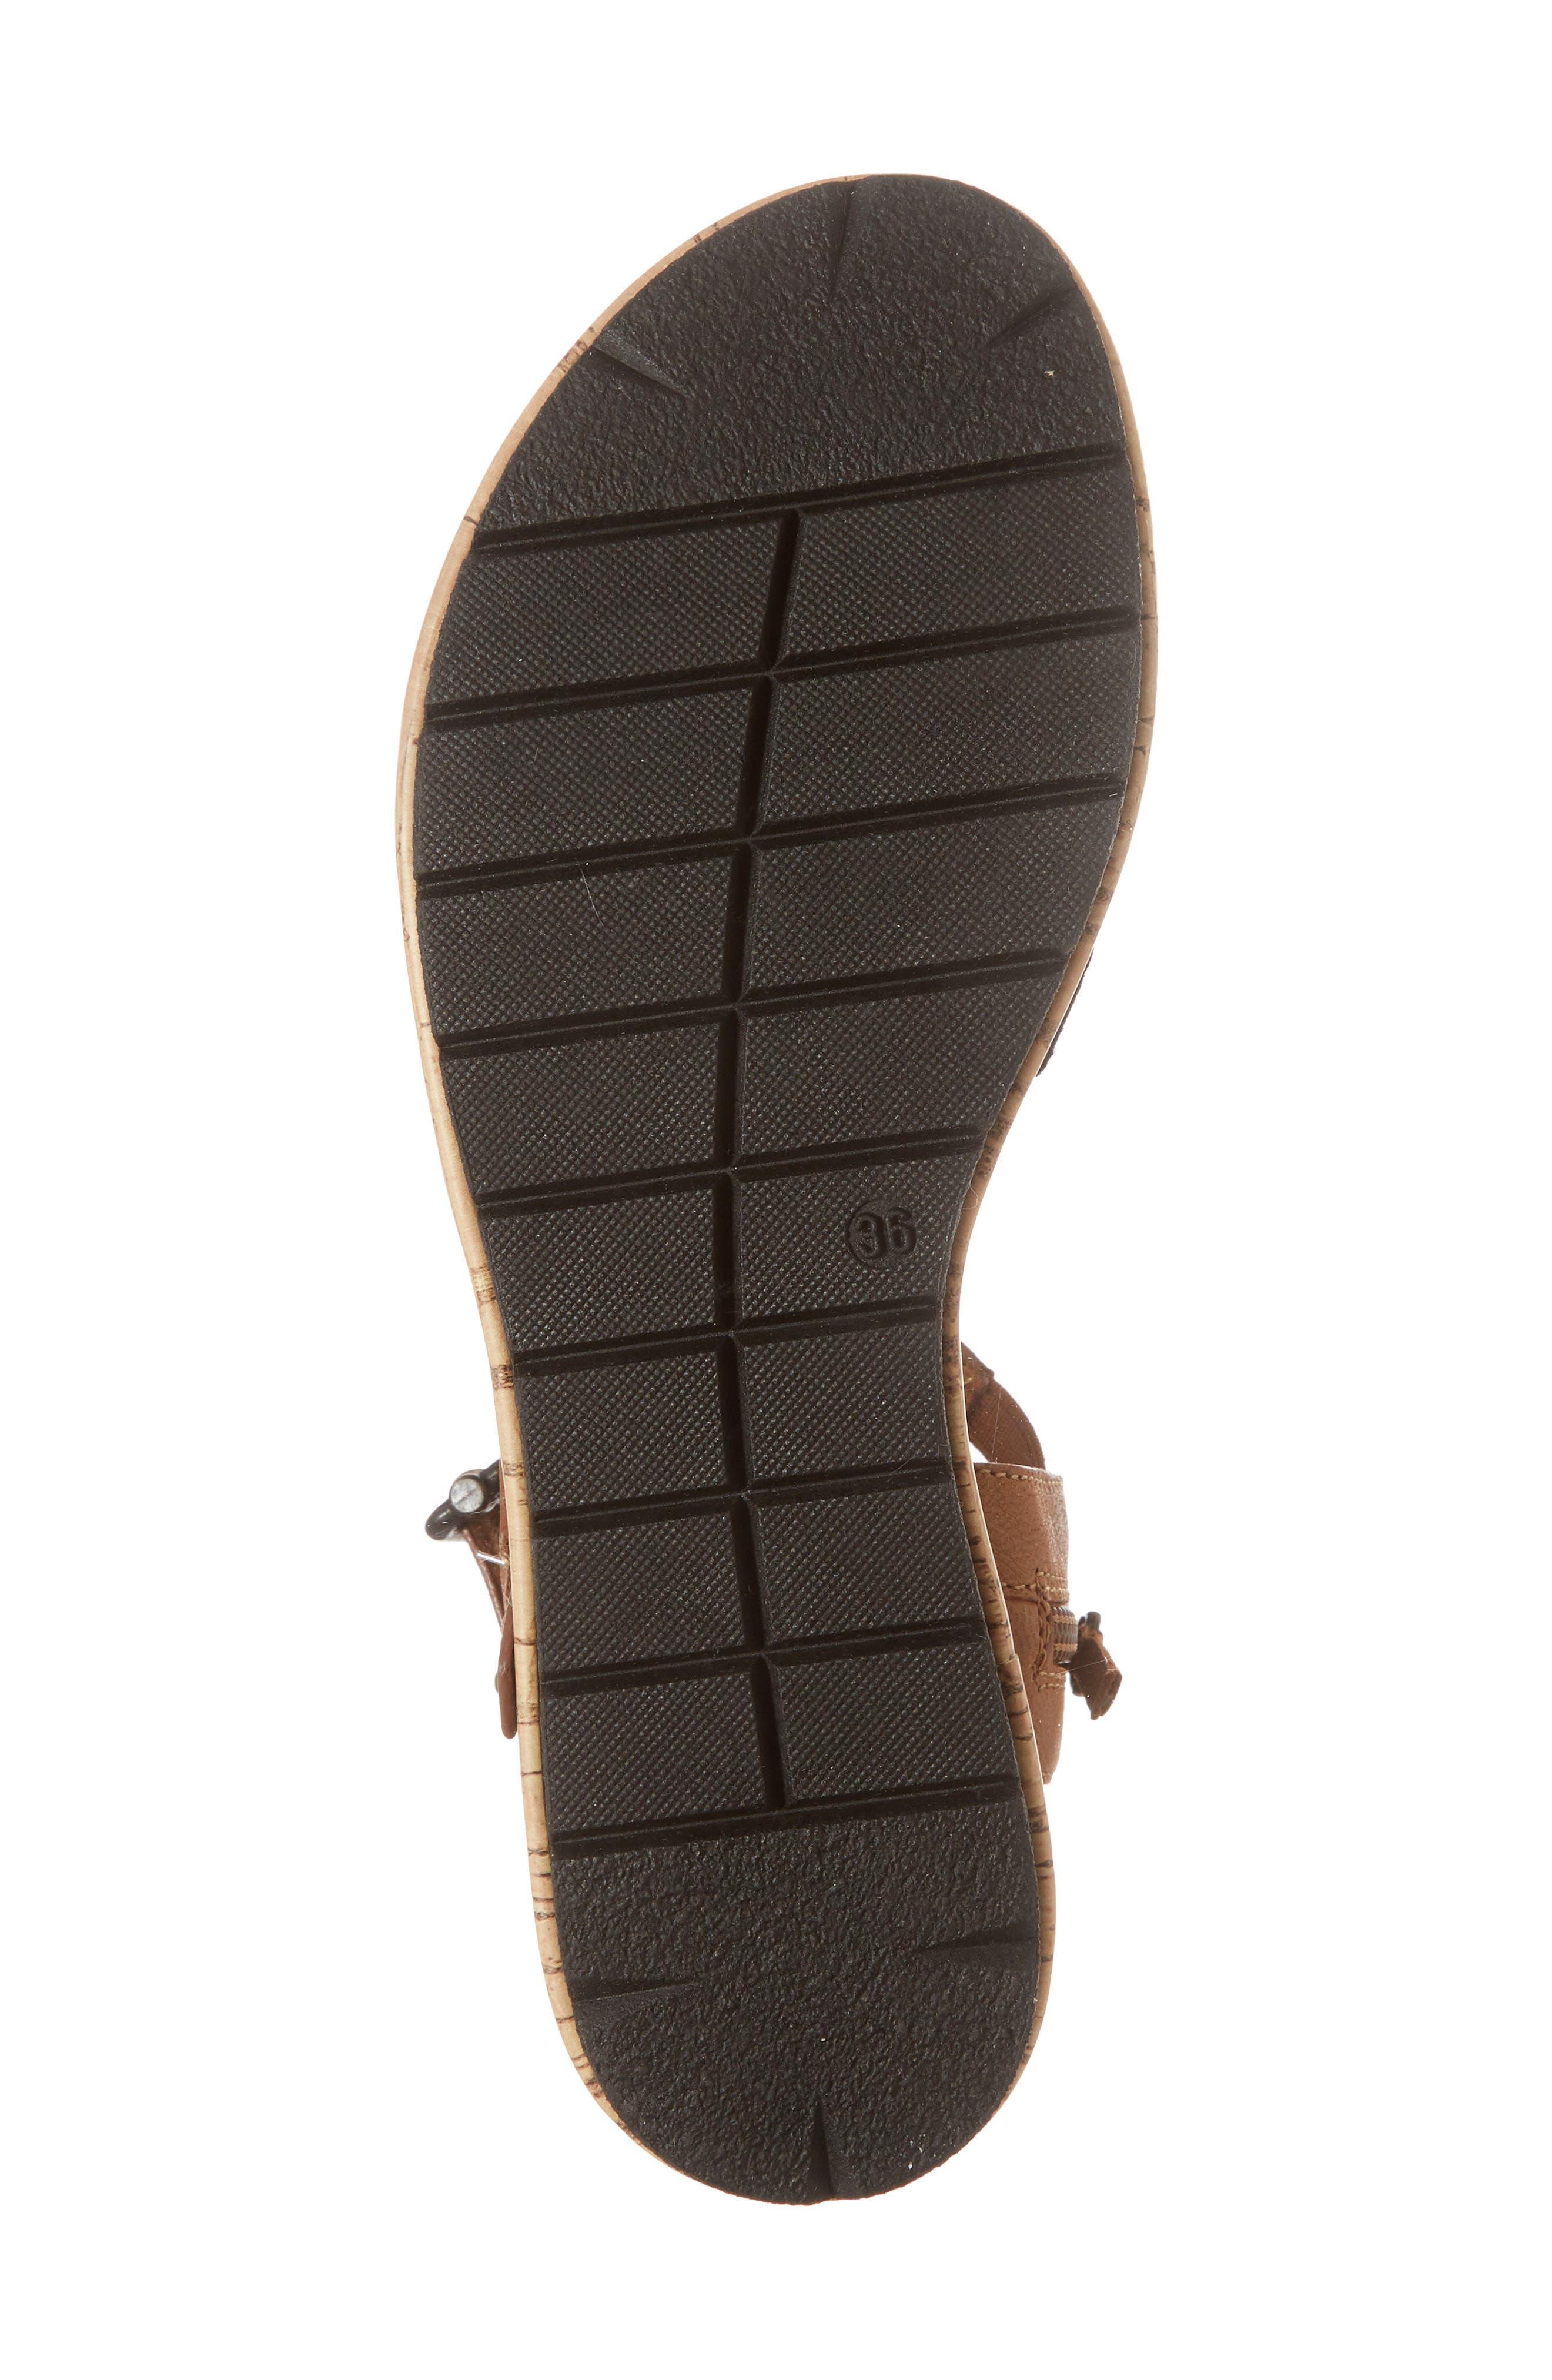 Eda Diagonal Strap Wedge Sandal,                             Alternate thumbnail 6, color,                             Navy/ Cognac Leather